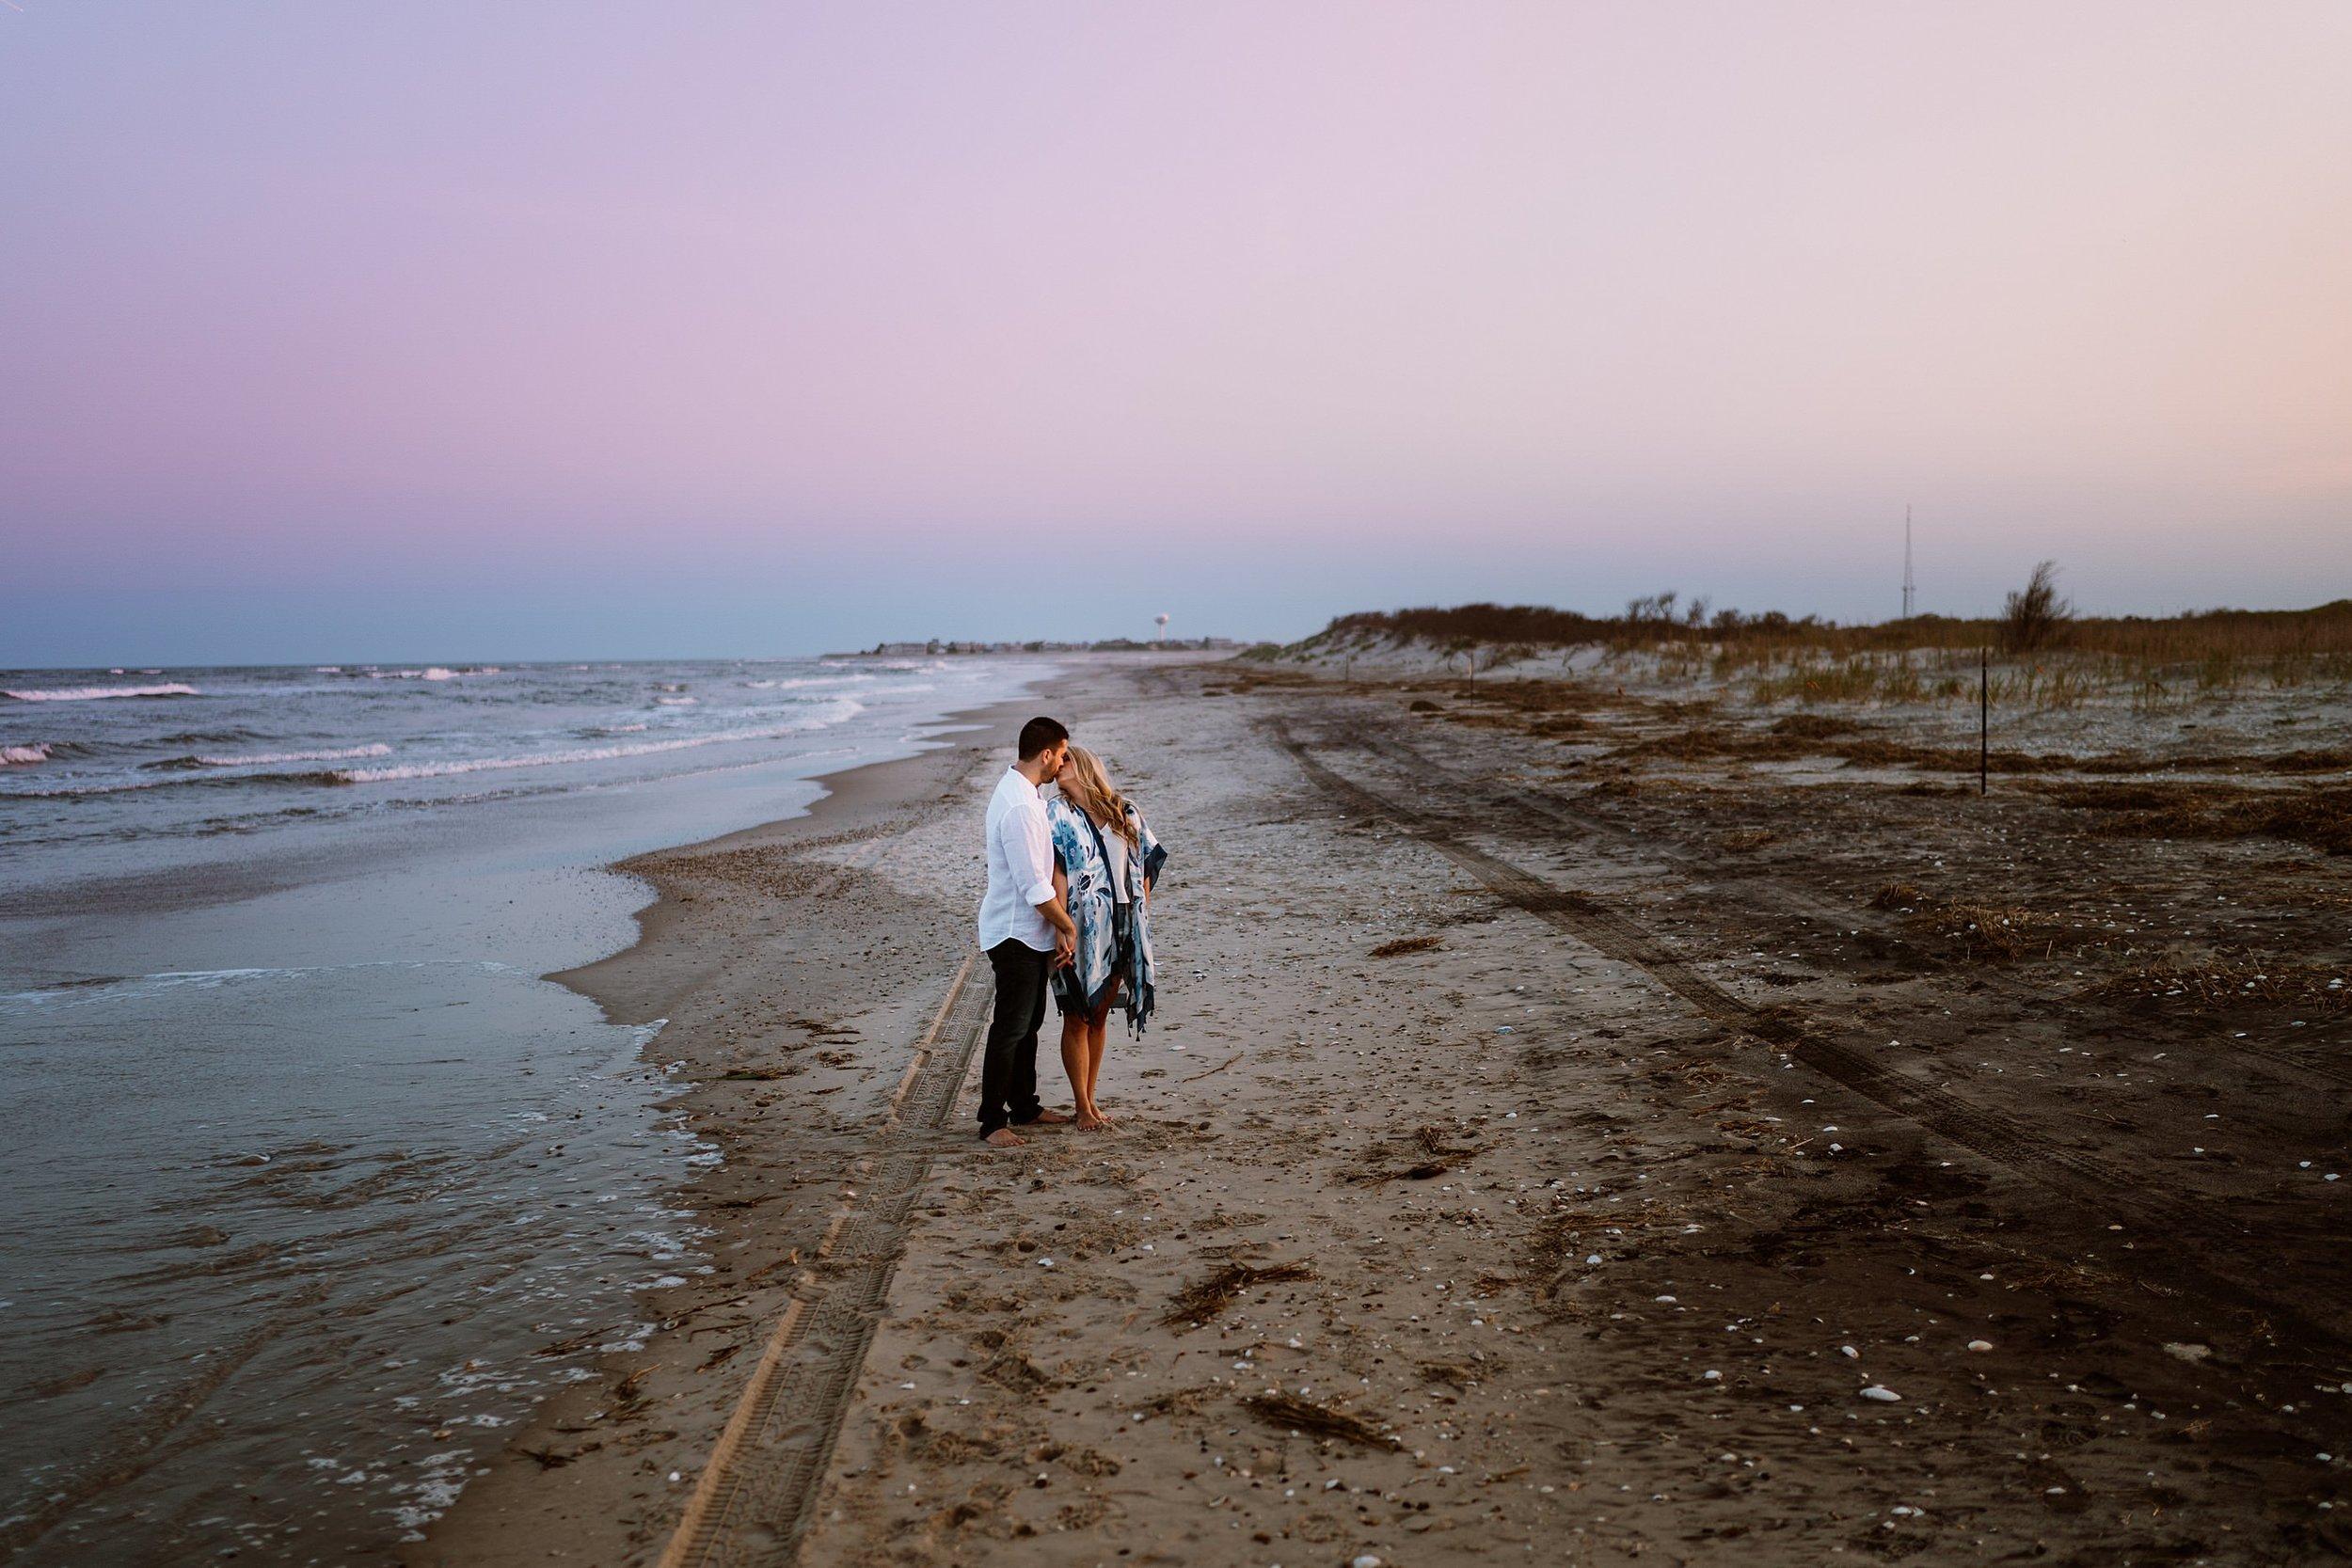 ocean-city-nj-engagement-photos-58.jpg